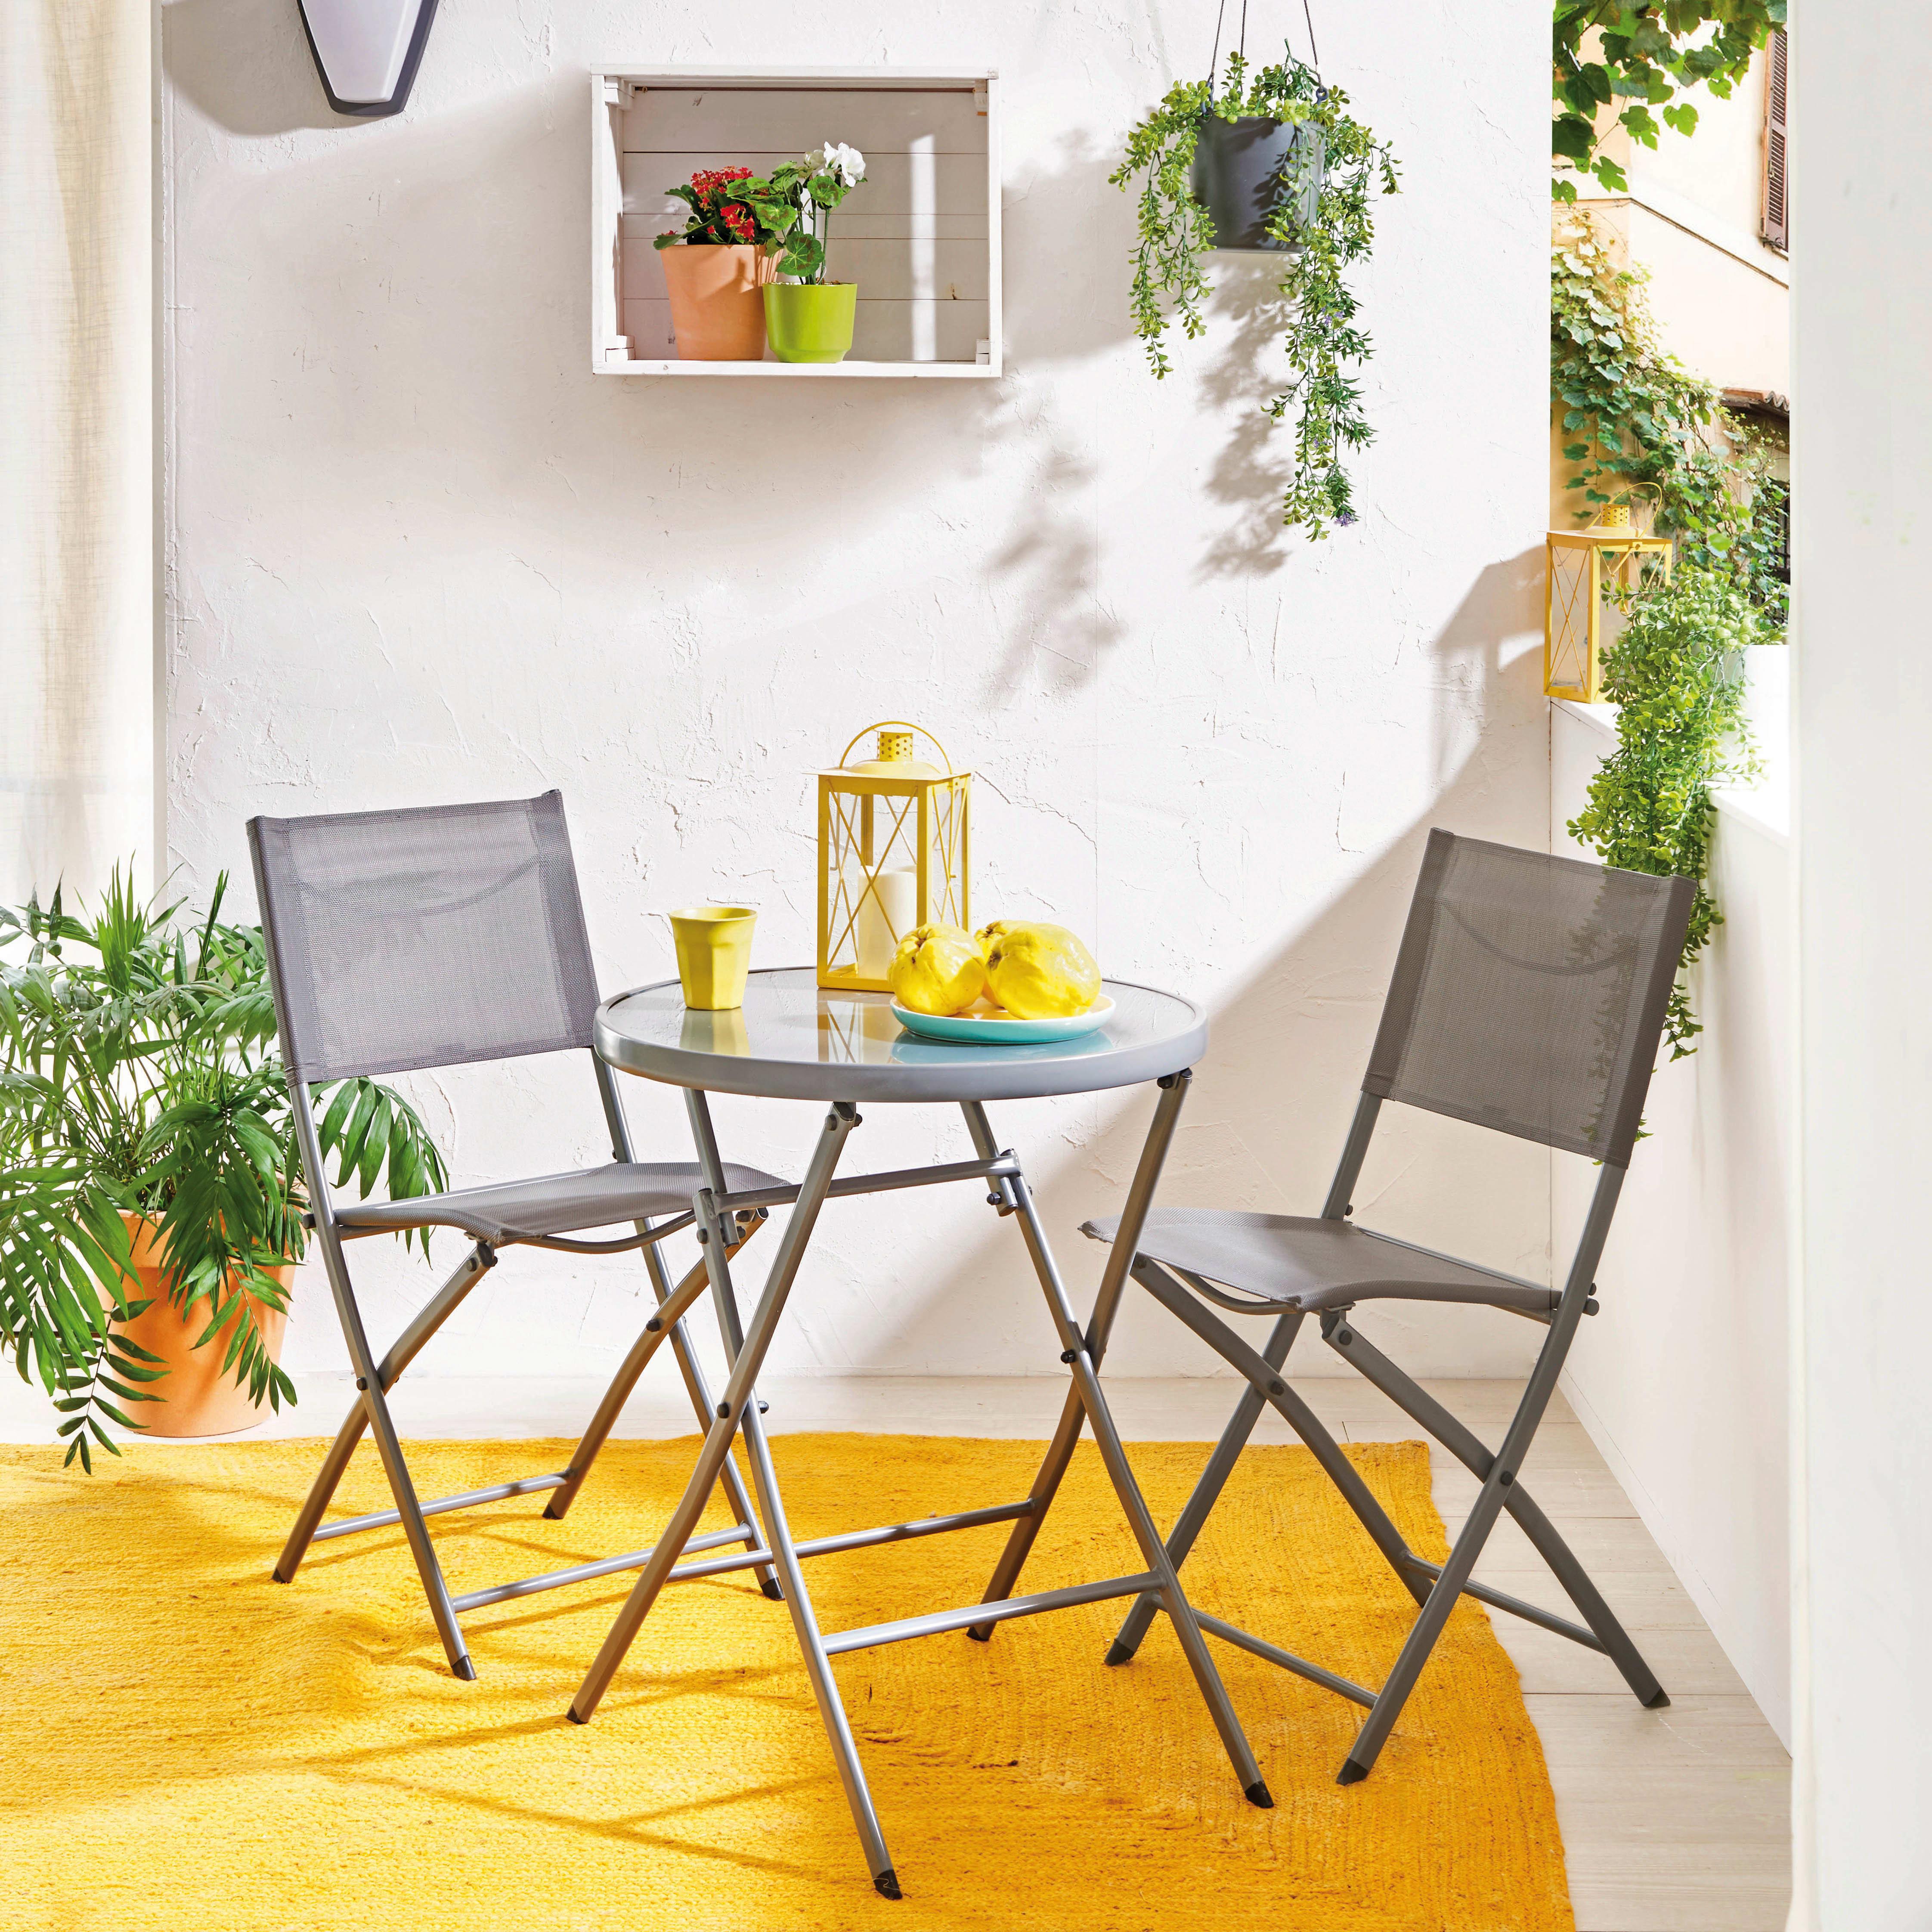 Set tavolo e sedie NATERIAL Emys in acciaio grigio argento 2 posti